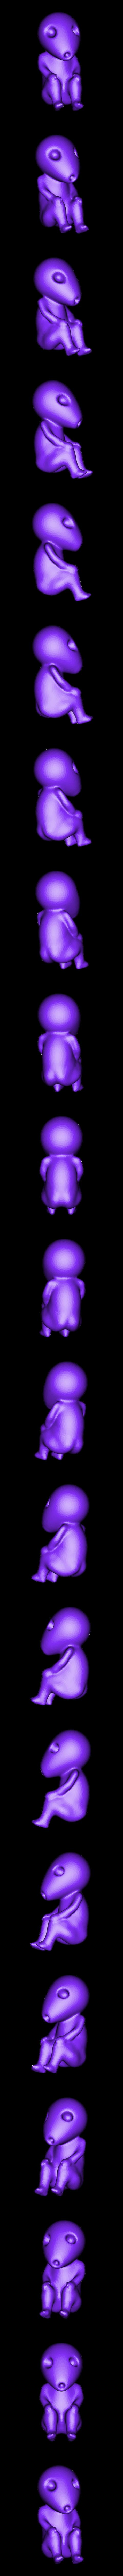 kodama pose 5.OBJ Download OBJ file Glowing Kodama Princess Mononoke Luminous Tree Elves. (6 poses) • 3D print object, paulienet